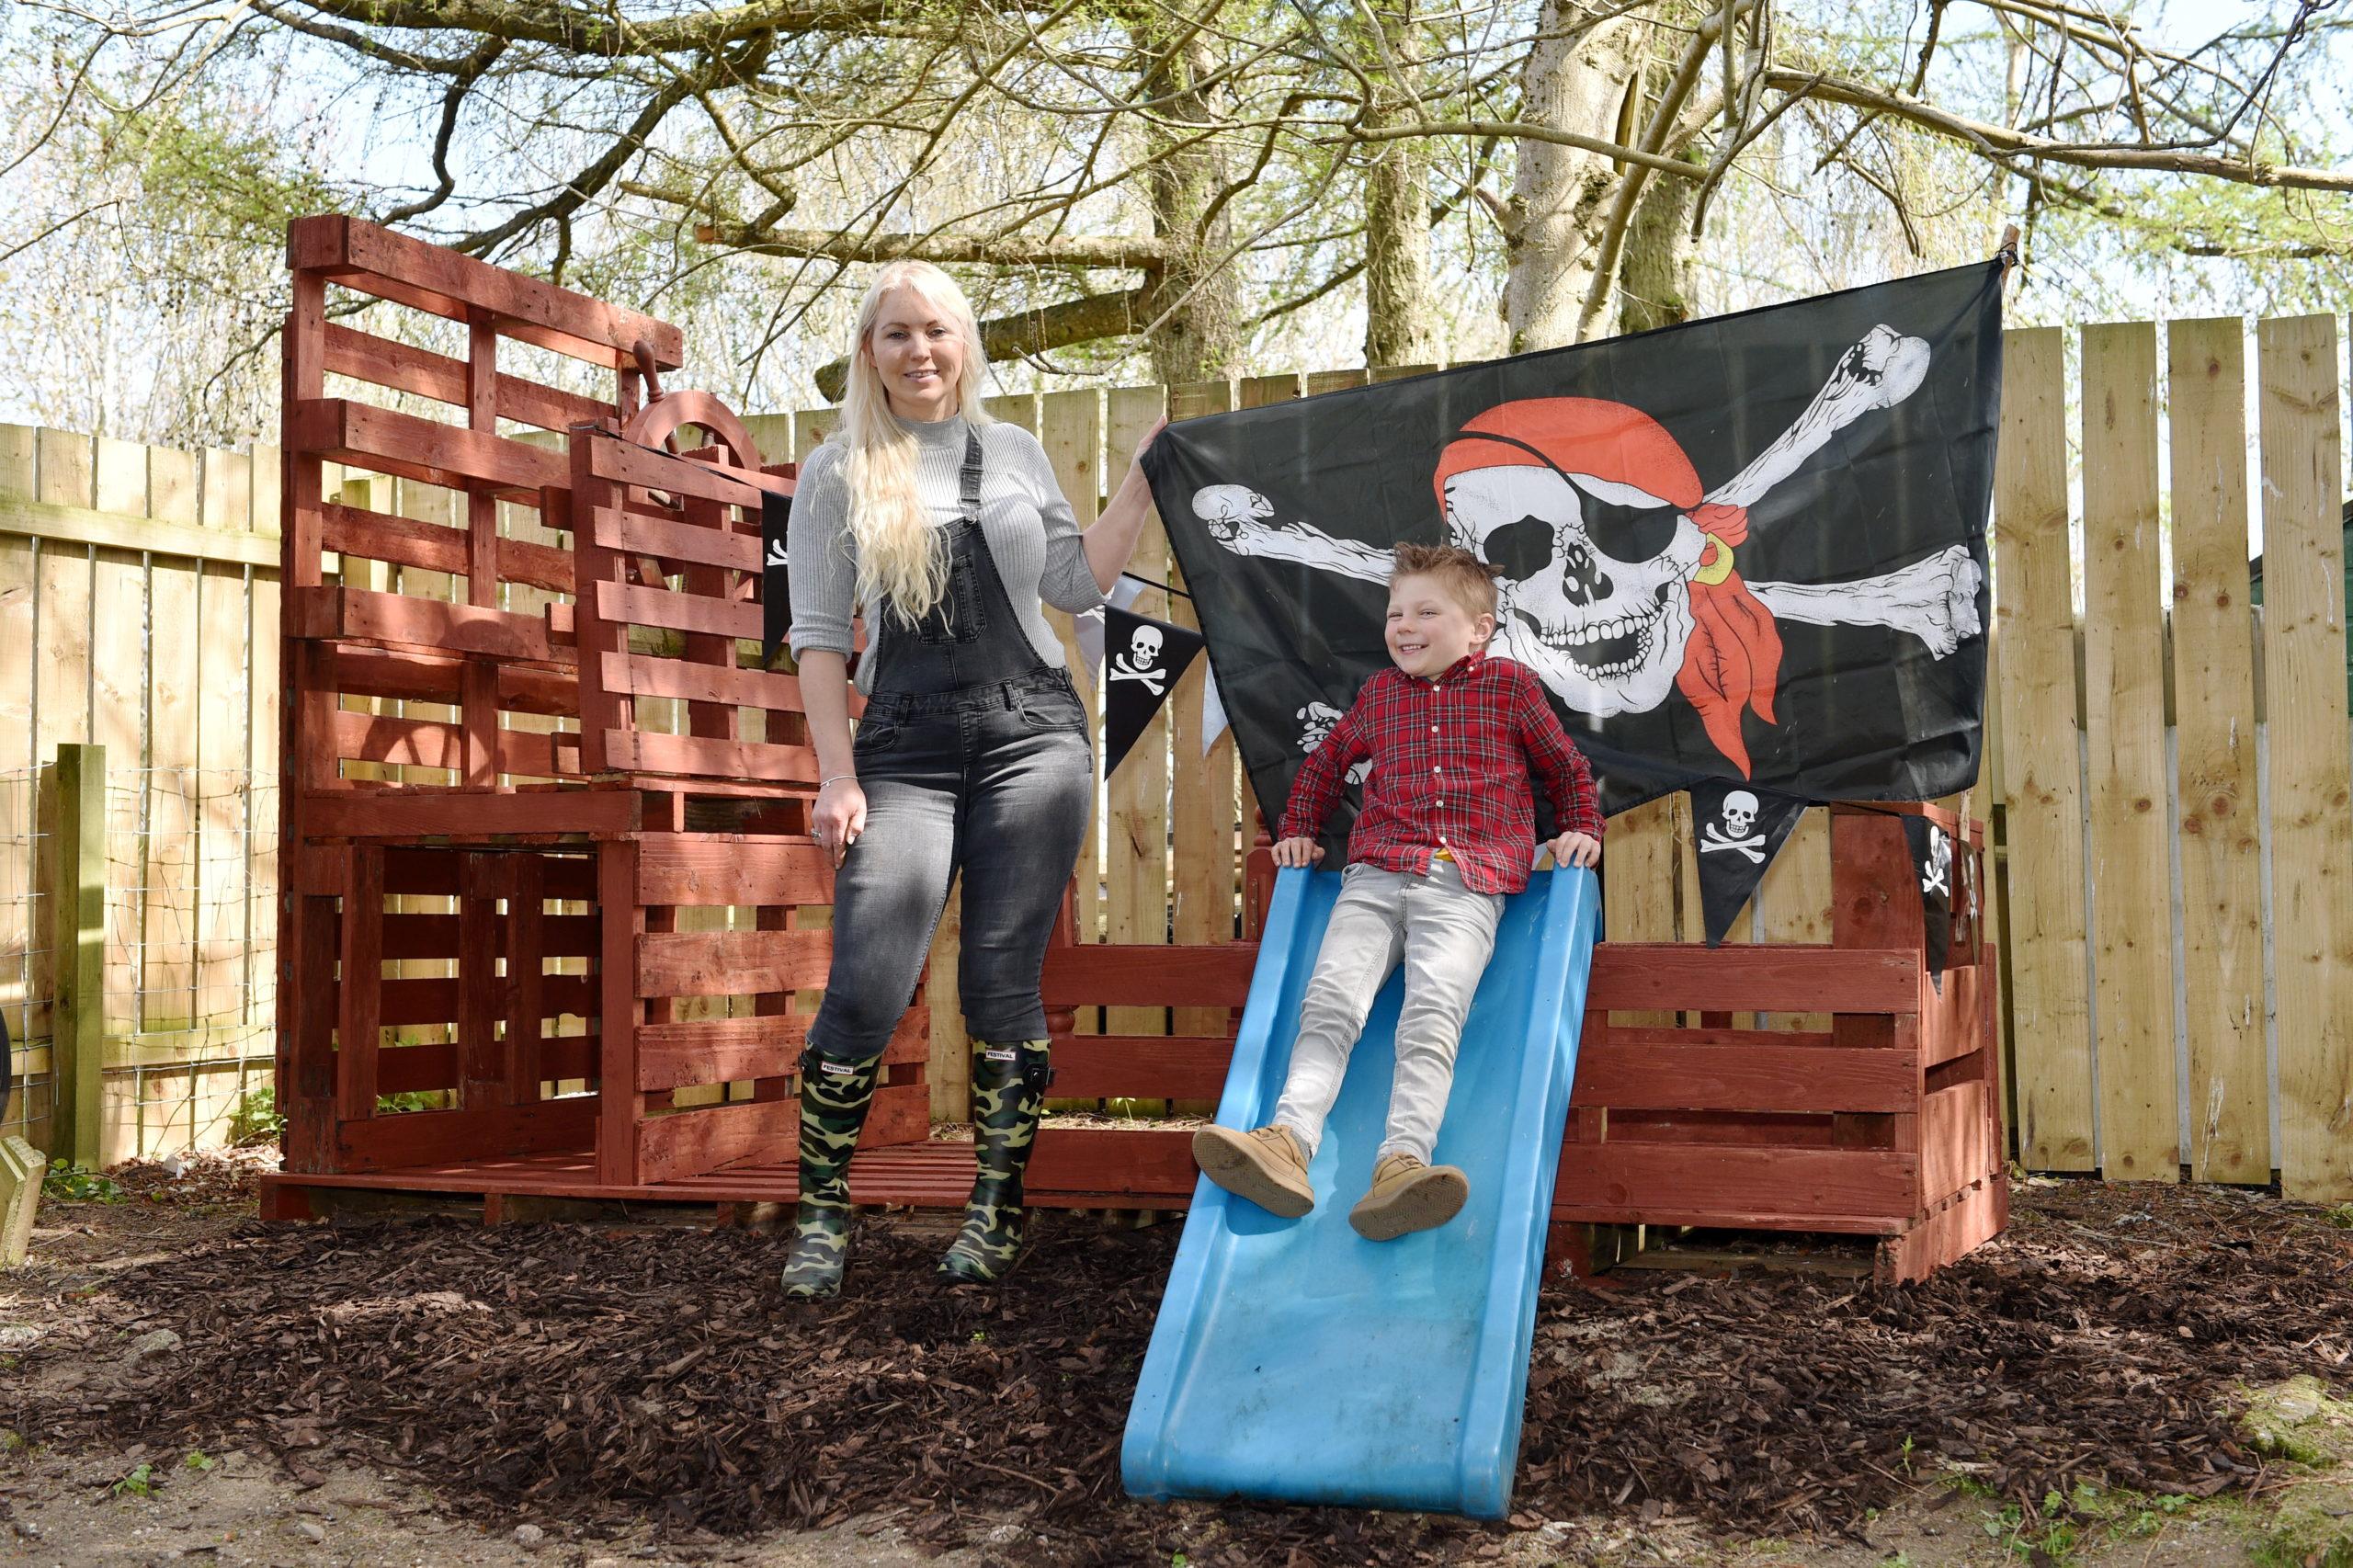 Michelle Barclay-Dunbar and her son Brandyn